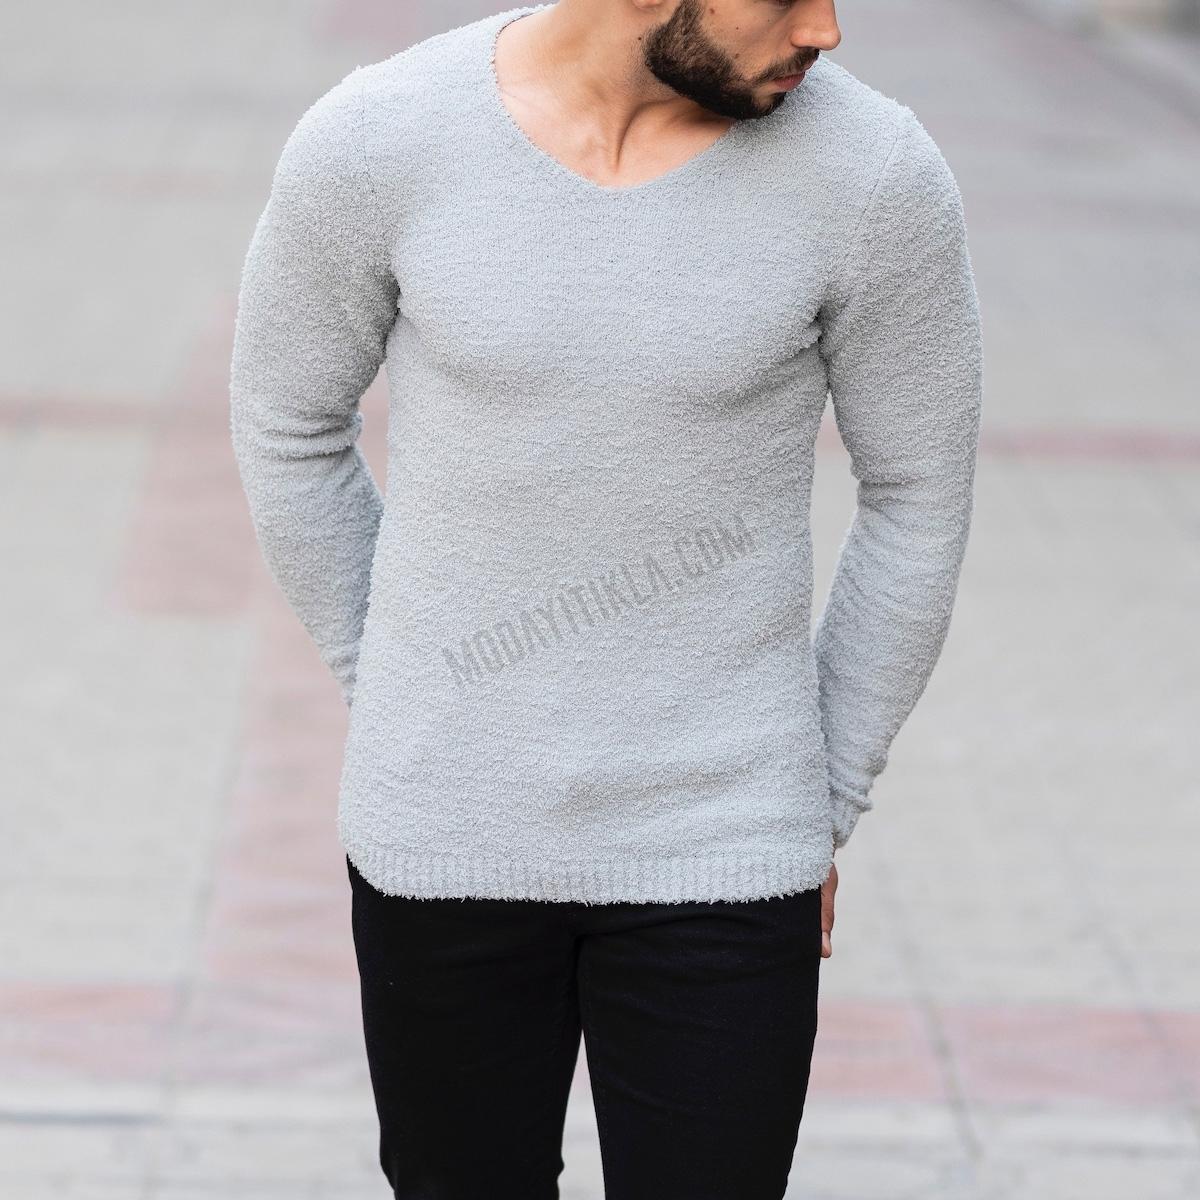 Erkek Havlu Kumaş Gri Sweatshirt